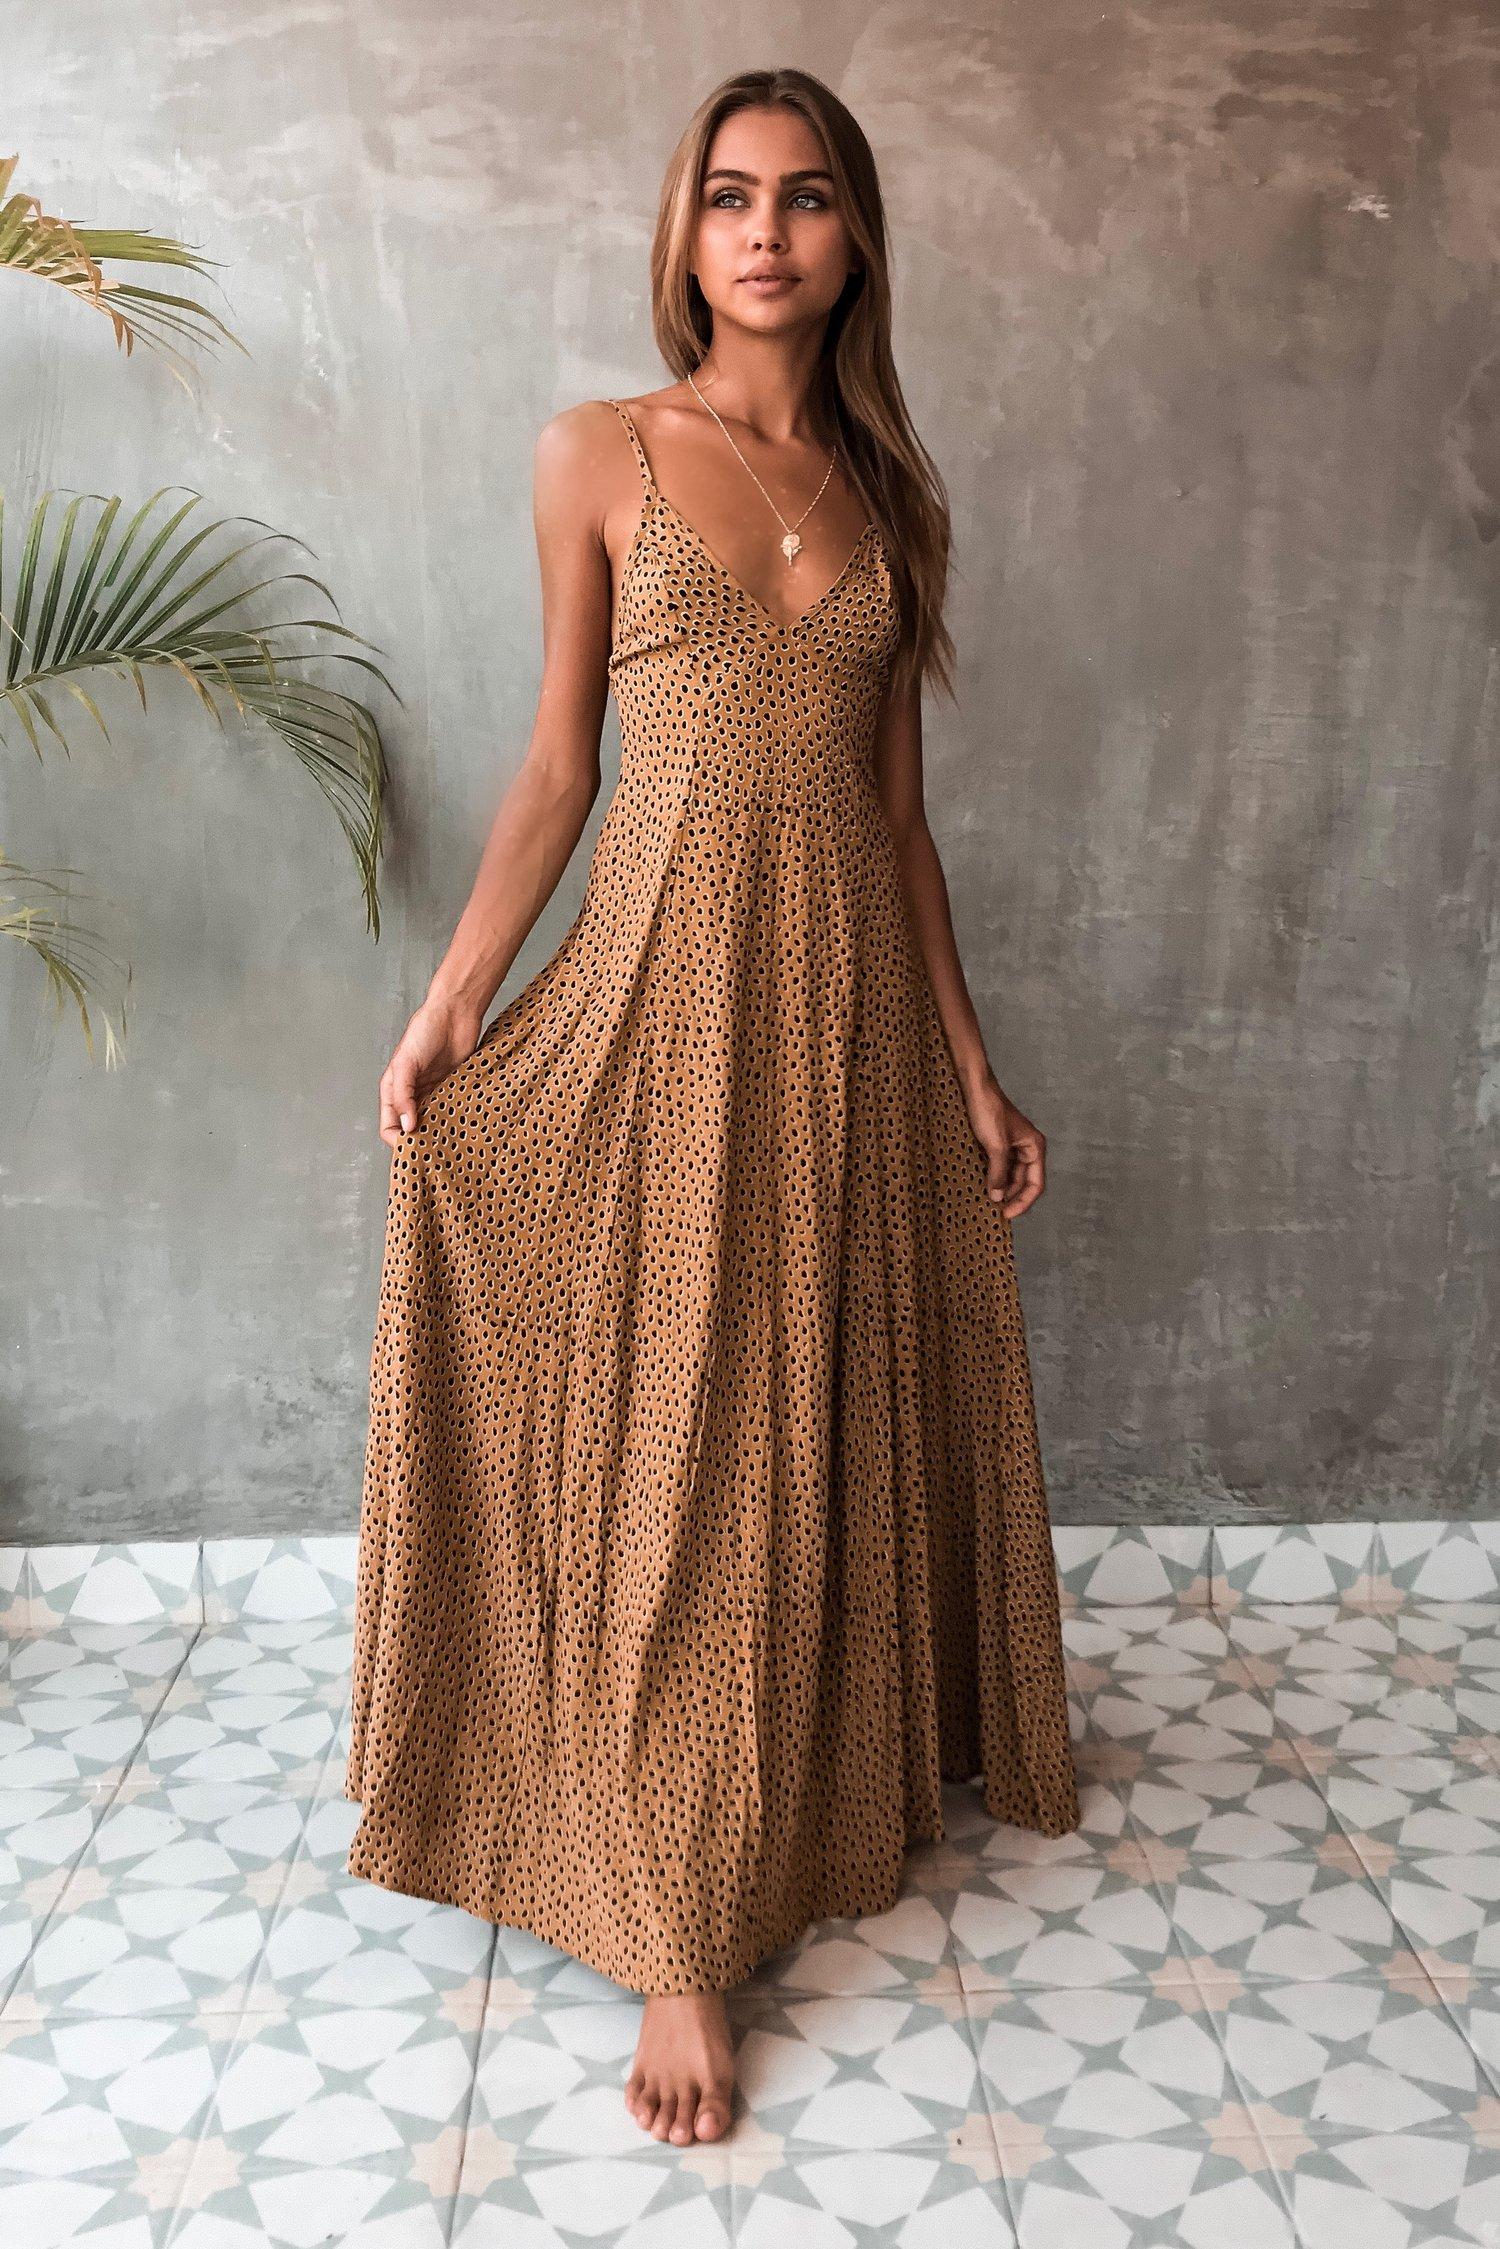 Image of VERADO DRESS - RANGER GOLD